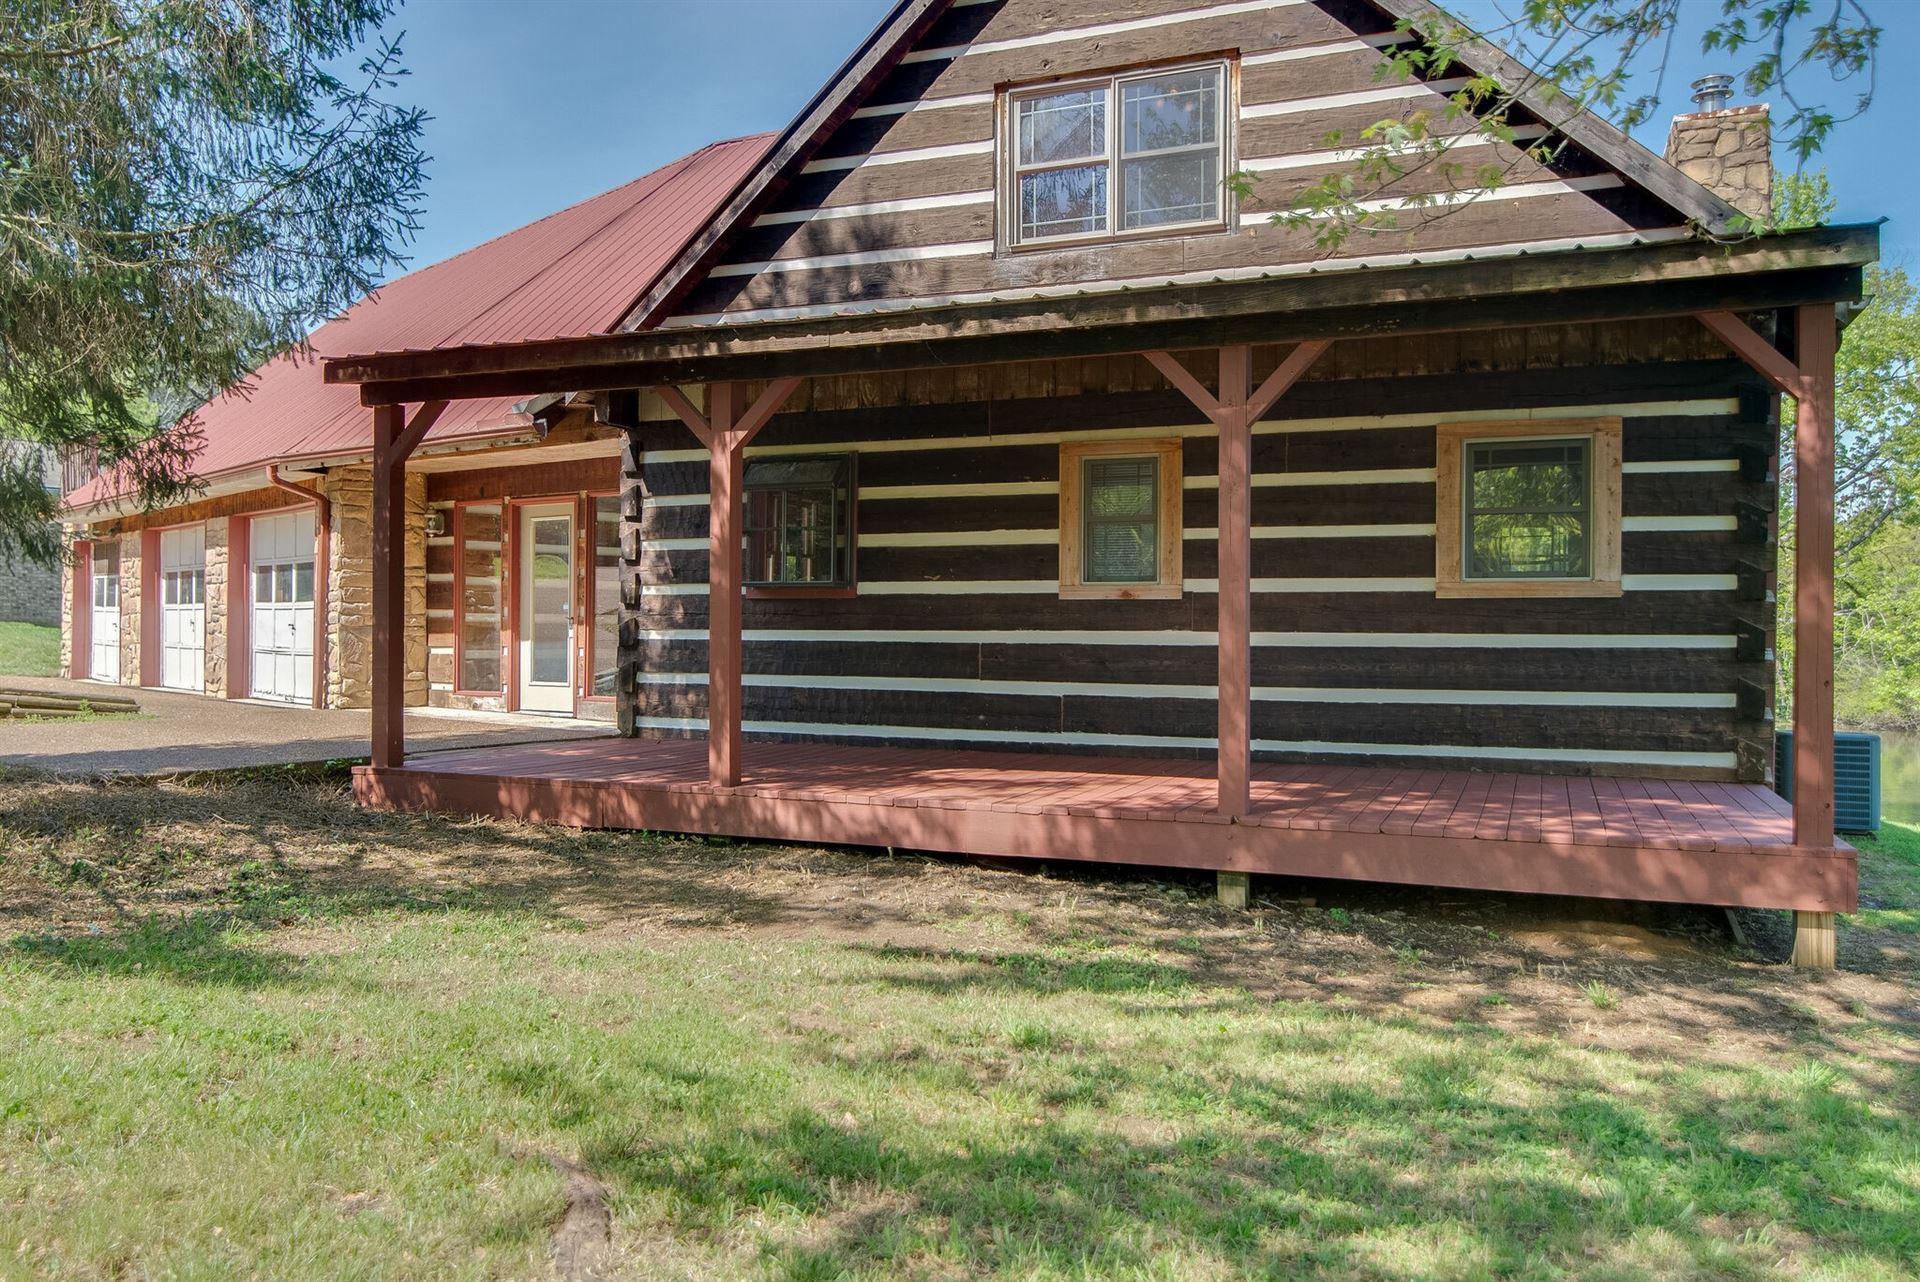 387 Lakeview Dr, Mount Juliet, TN 37122 - MLS#: 2248568